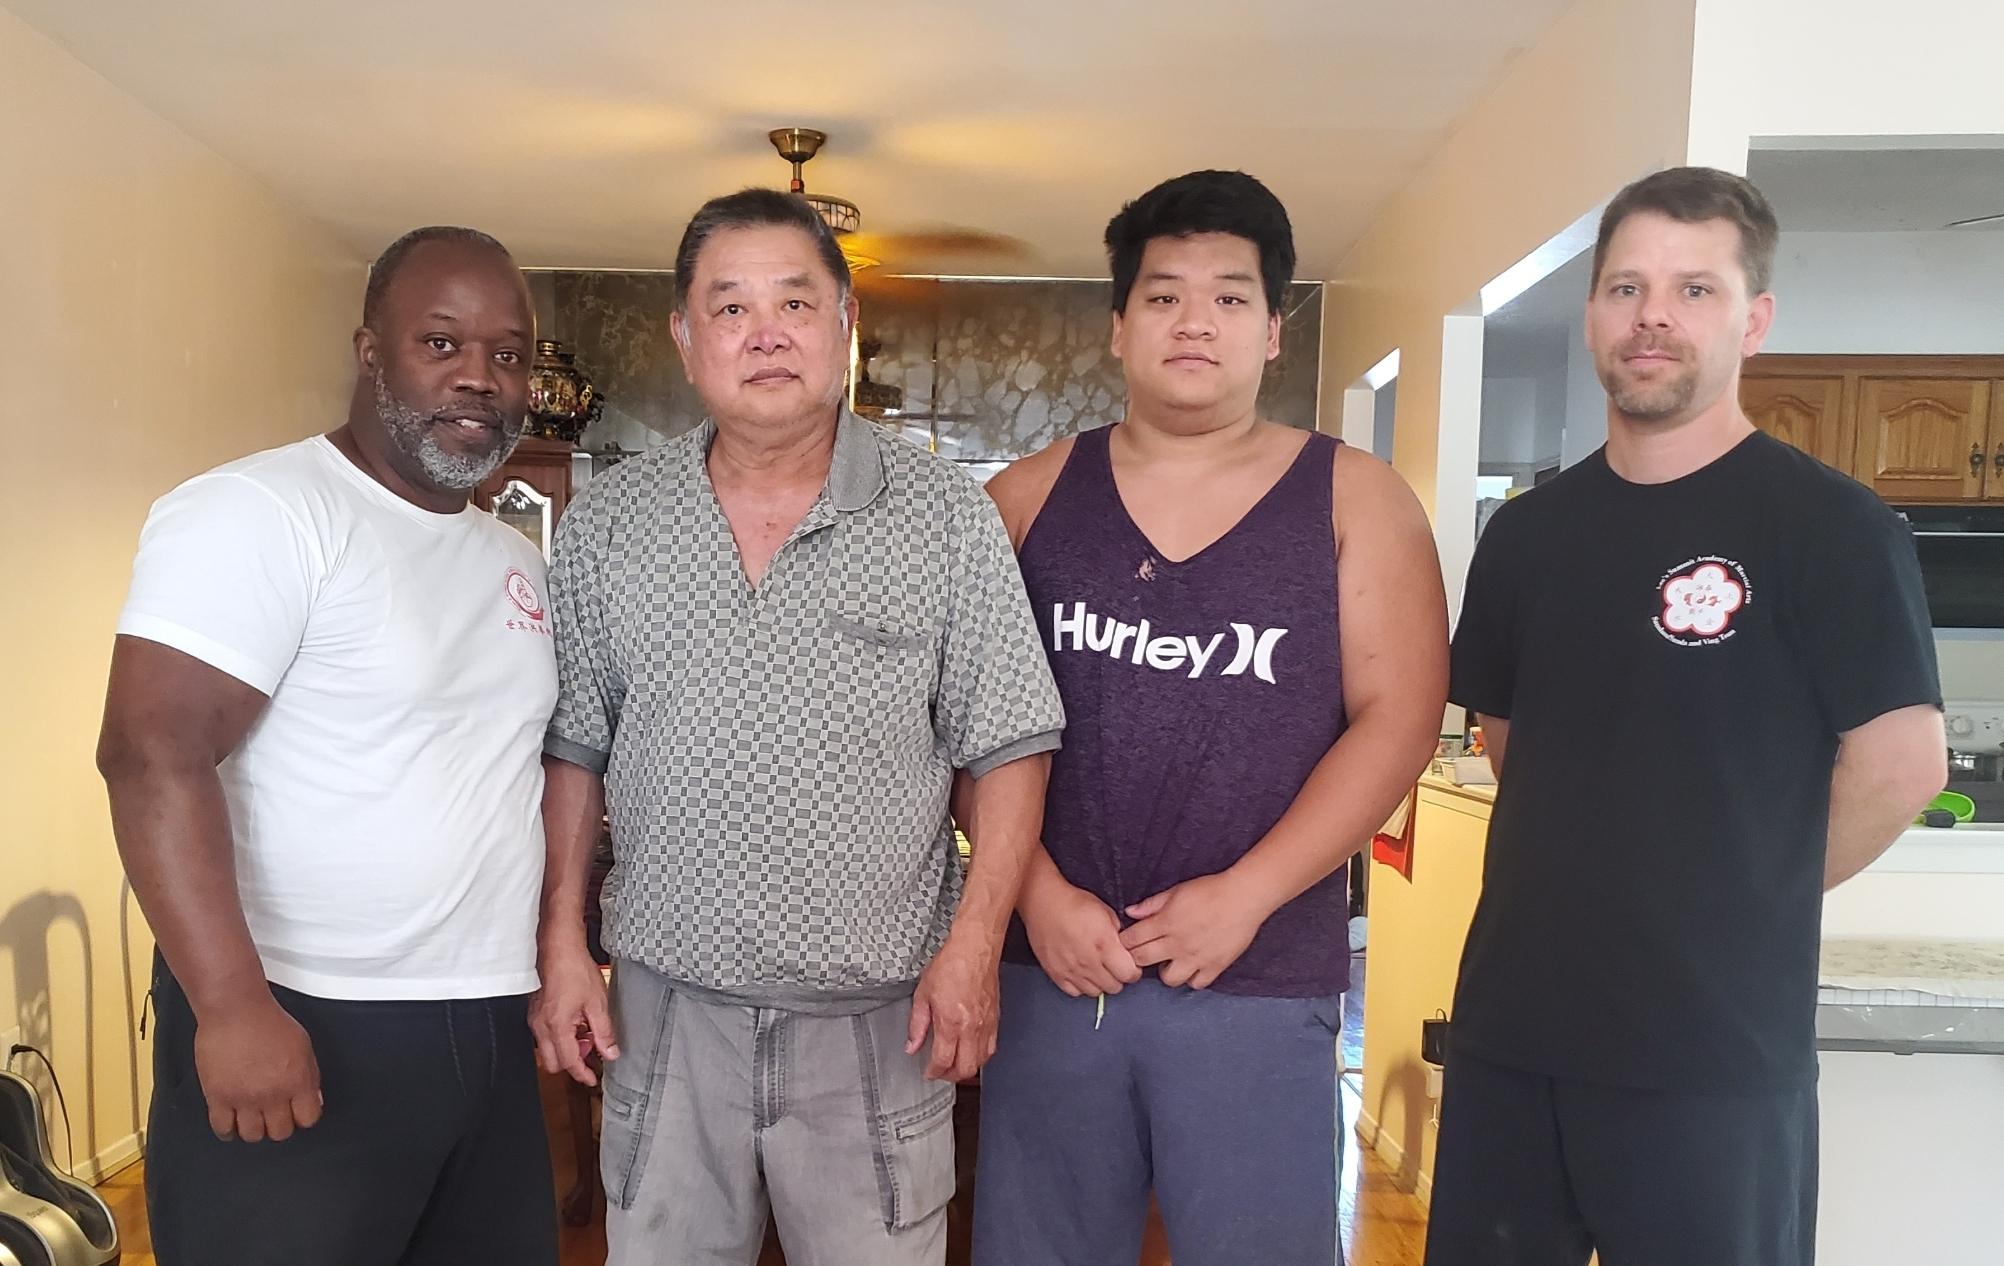 Sifu Anael-bey and Sifu McKillip pay visits to GM Chin